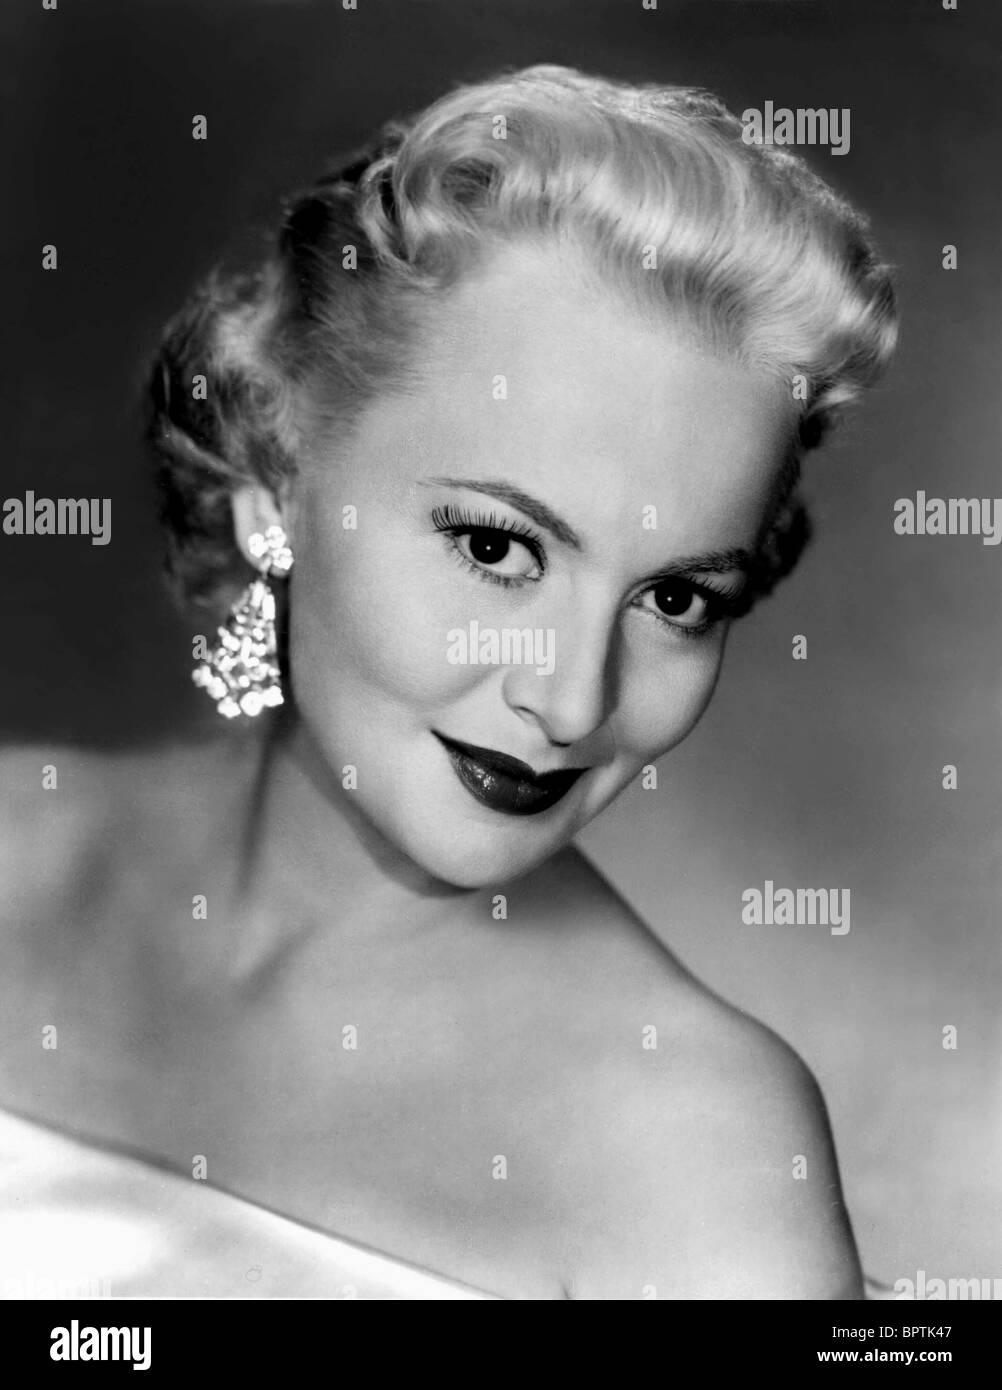 OLIVIA DE HAVILLAND ACTRESS (1956) - Stock Image